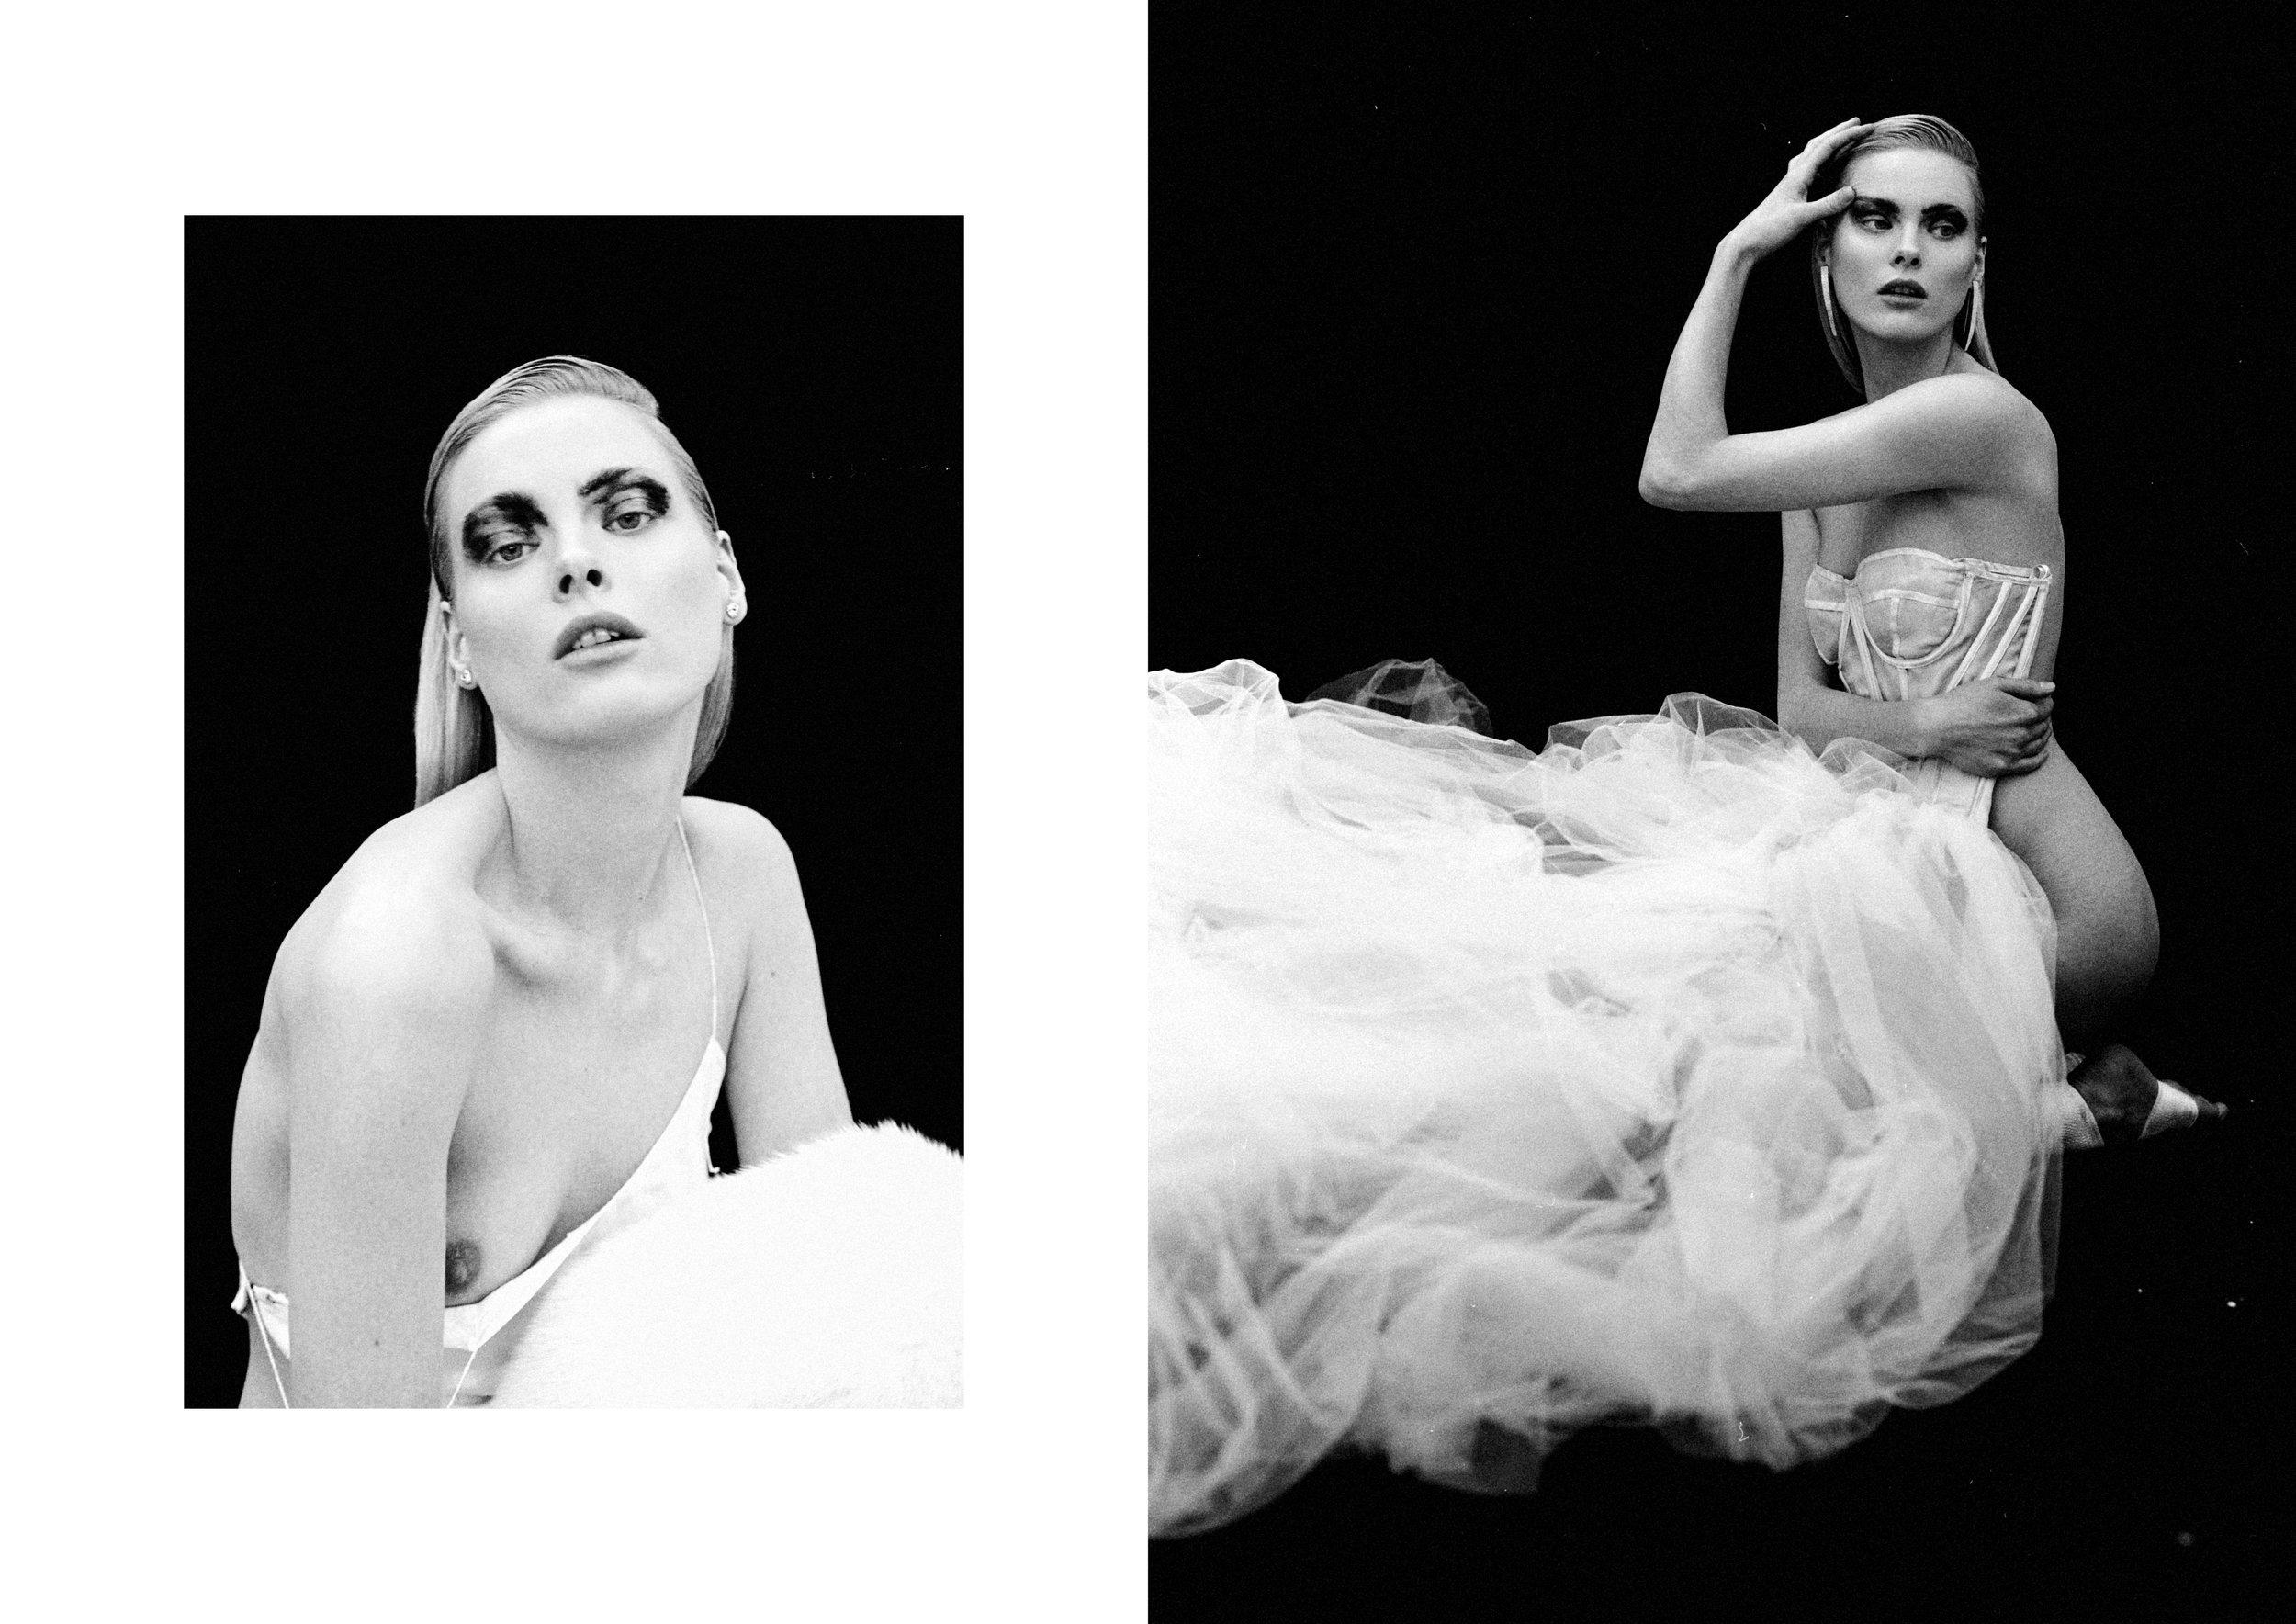 White Swan by Cristian Davila Hernandez_03.jpg